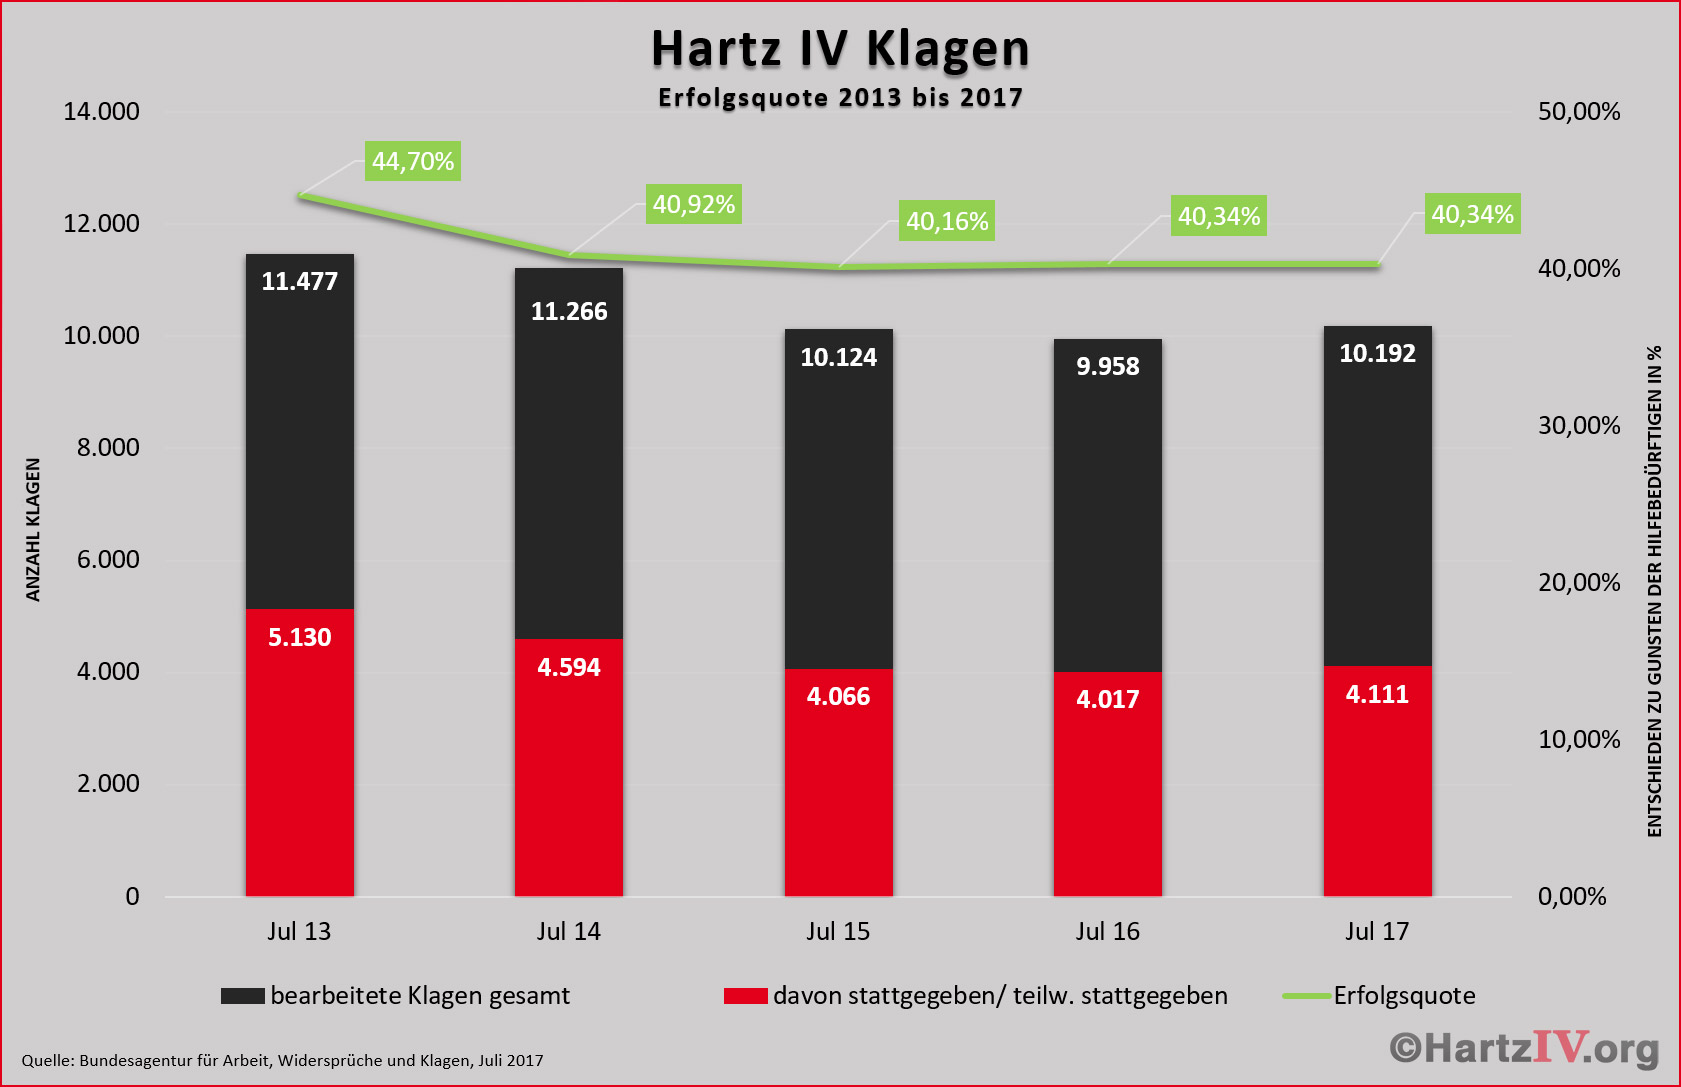 Hartz 4 Bedarfsgemeinschaft Umgehen